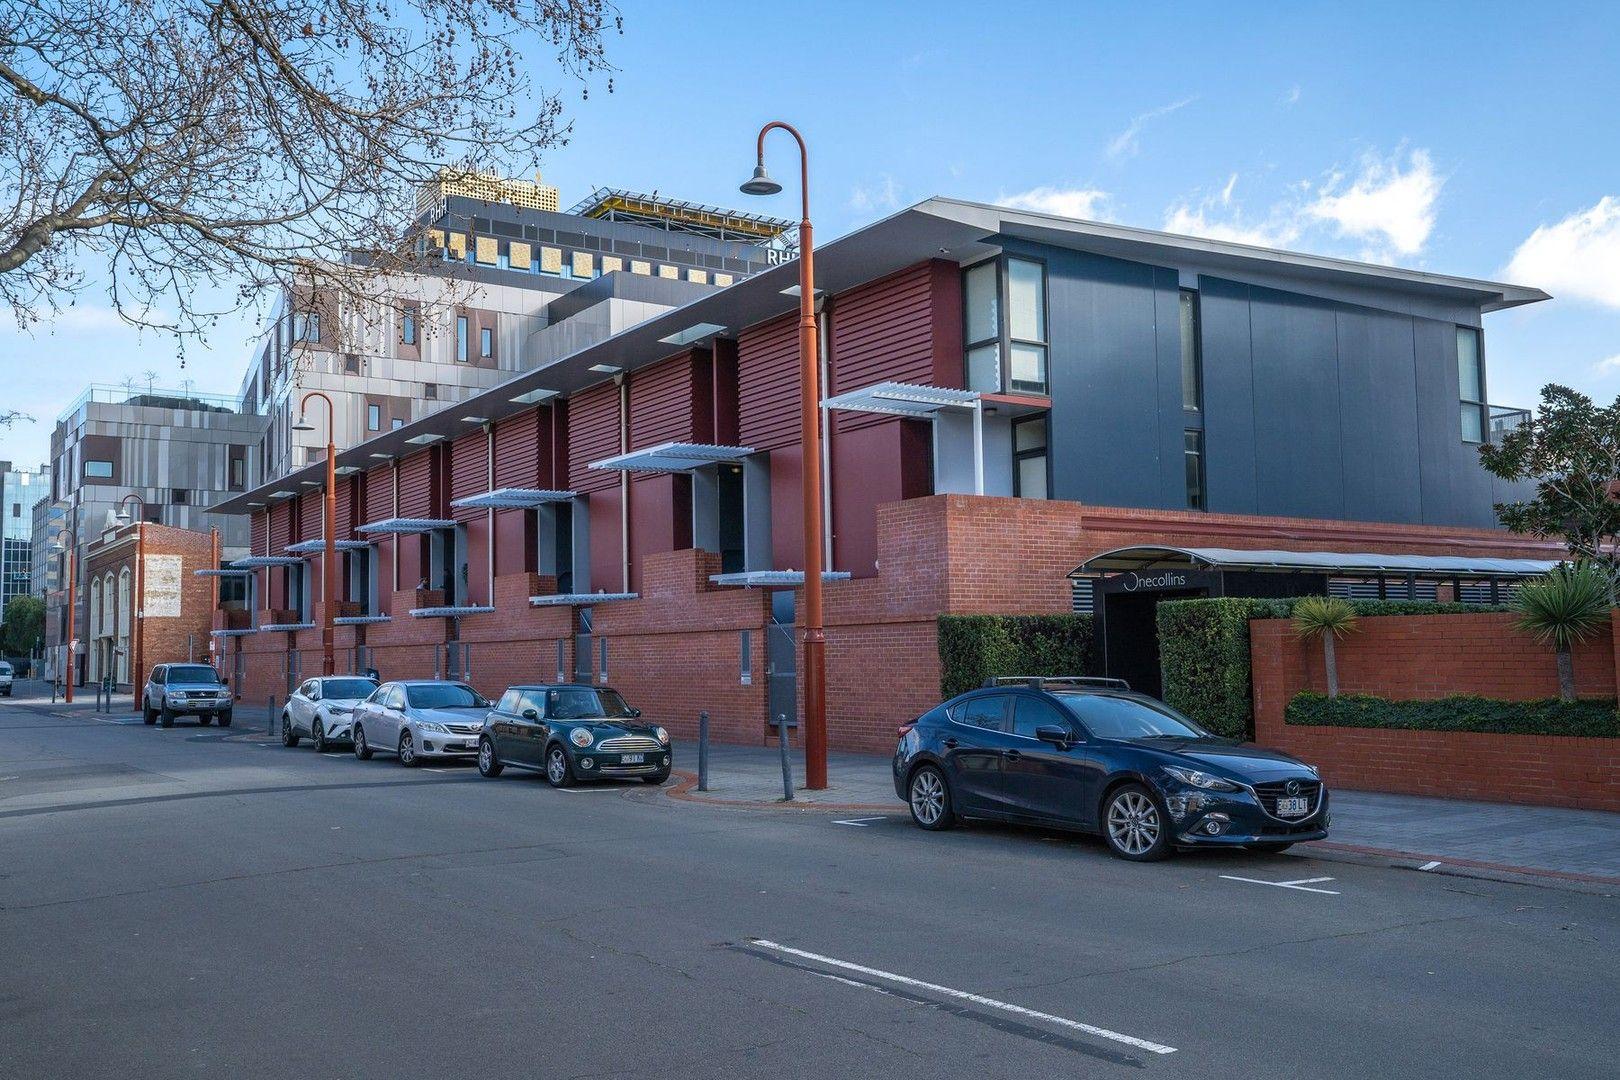 3 bedrooms Townhouse in 6/1 Collins Street HOBART TAS, 7000